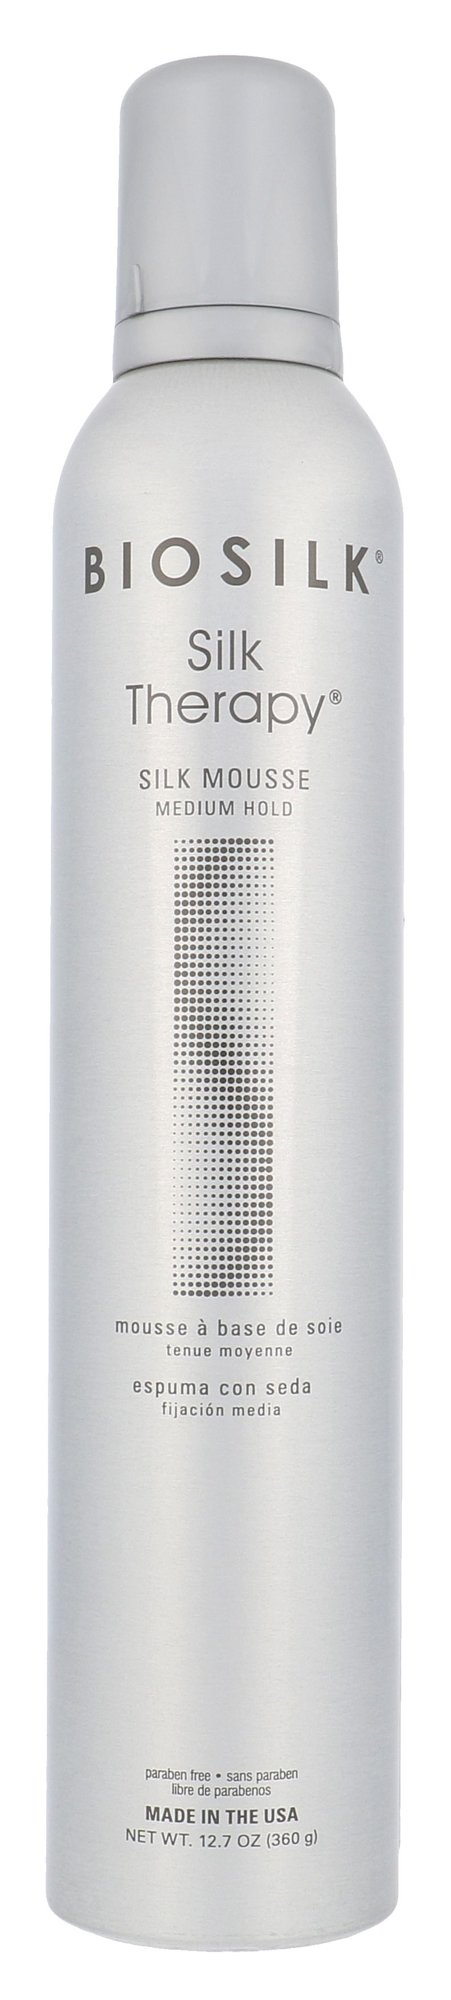 Farouk Systems Biosilk Silk Therapy Mousse Medium Hold Cosmetic 360g